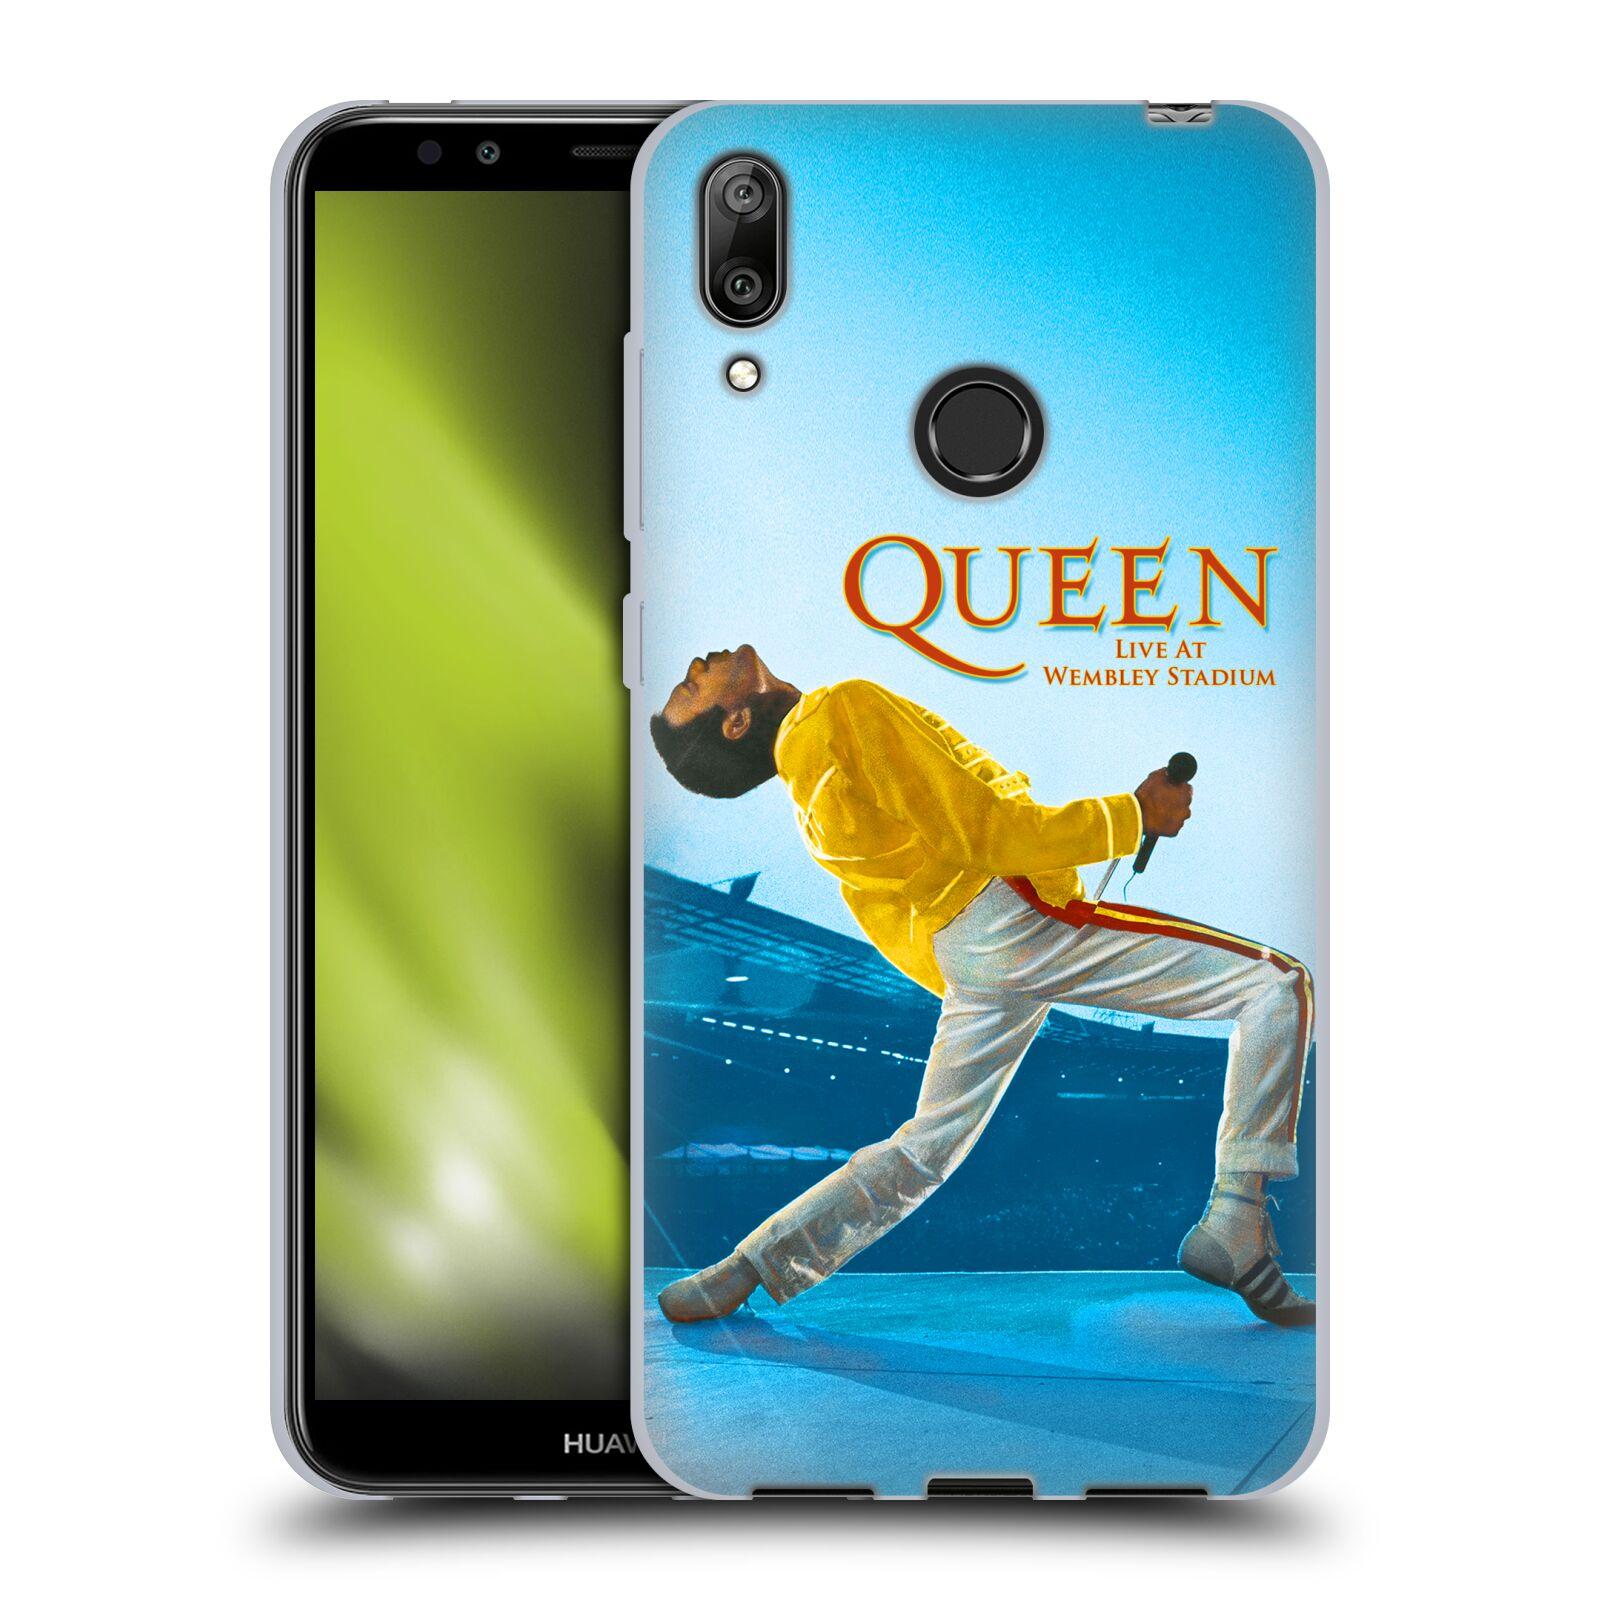 Silikonové pouzdro na mobil Huawei Y7 (2019) - Head Case - Queen - Freddie Mercury